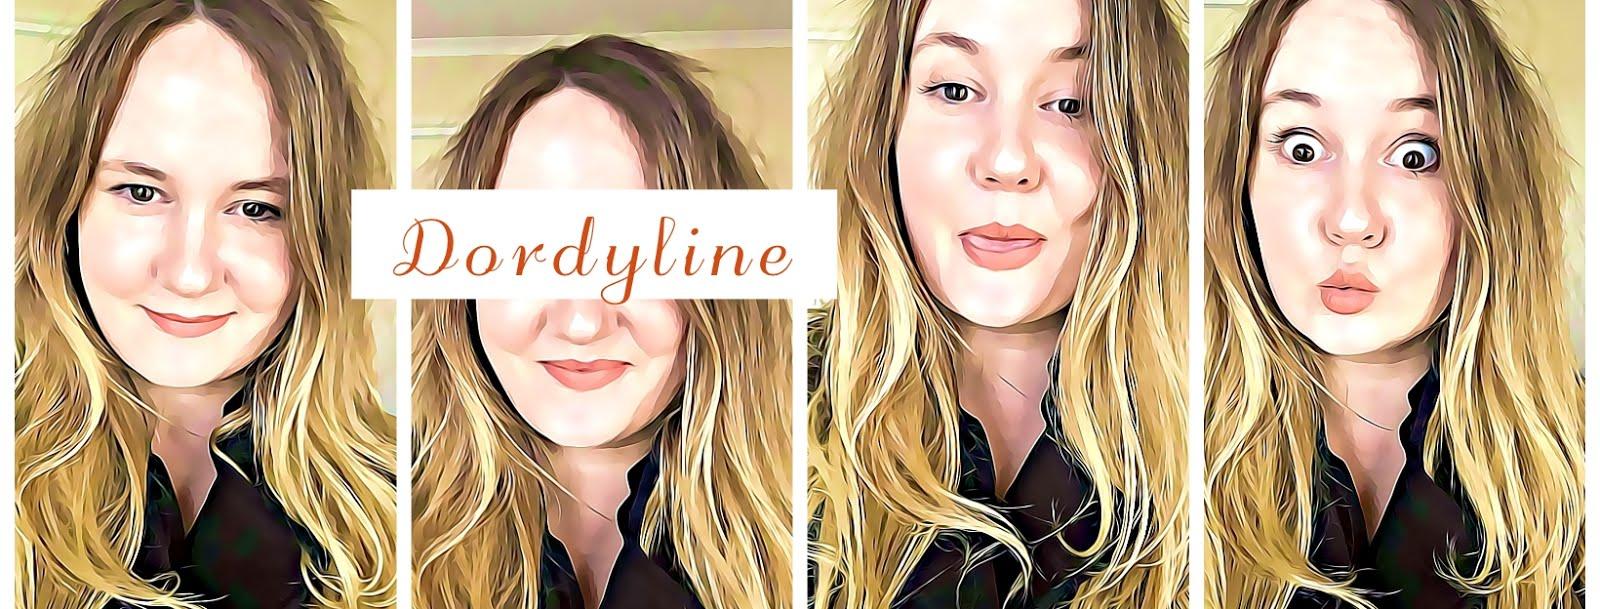 Dordyline